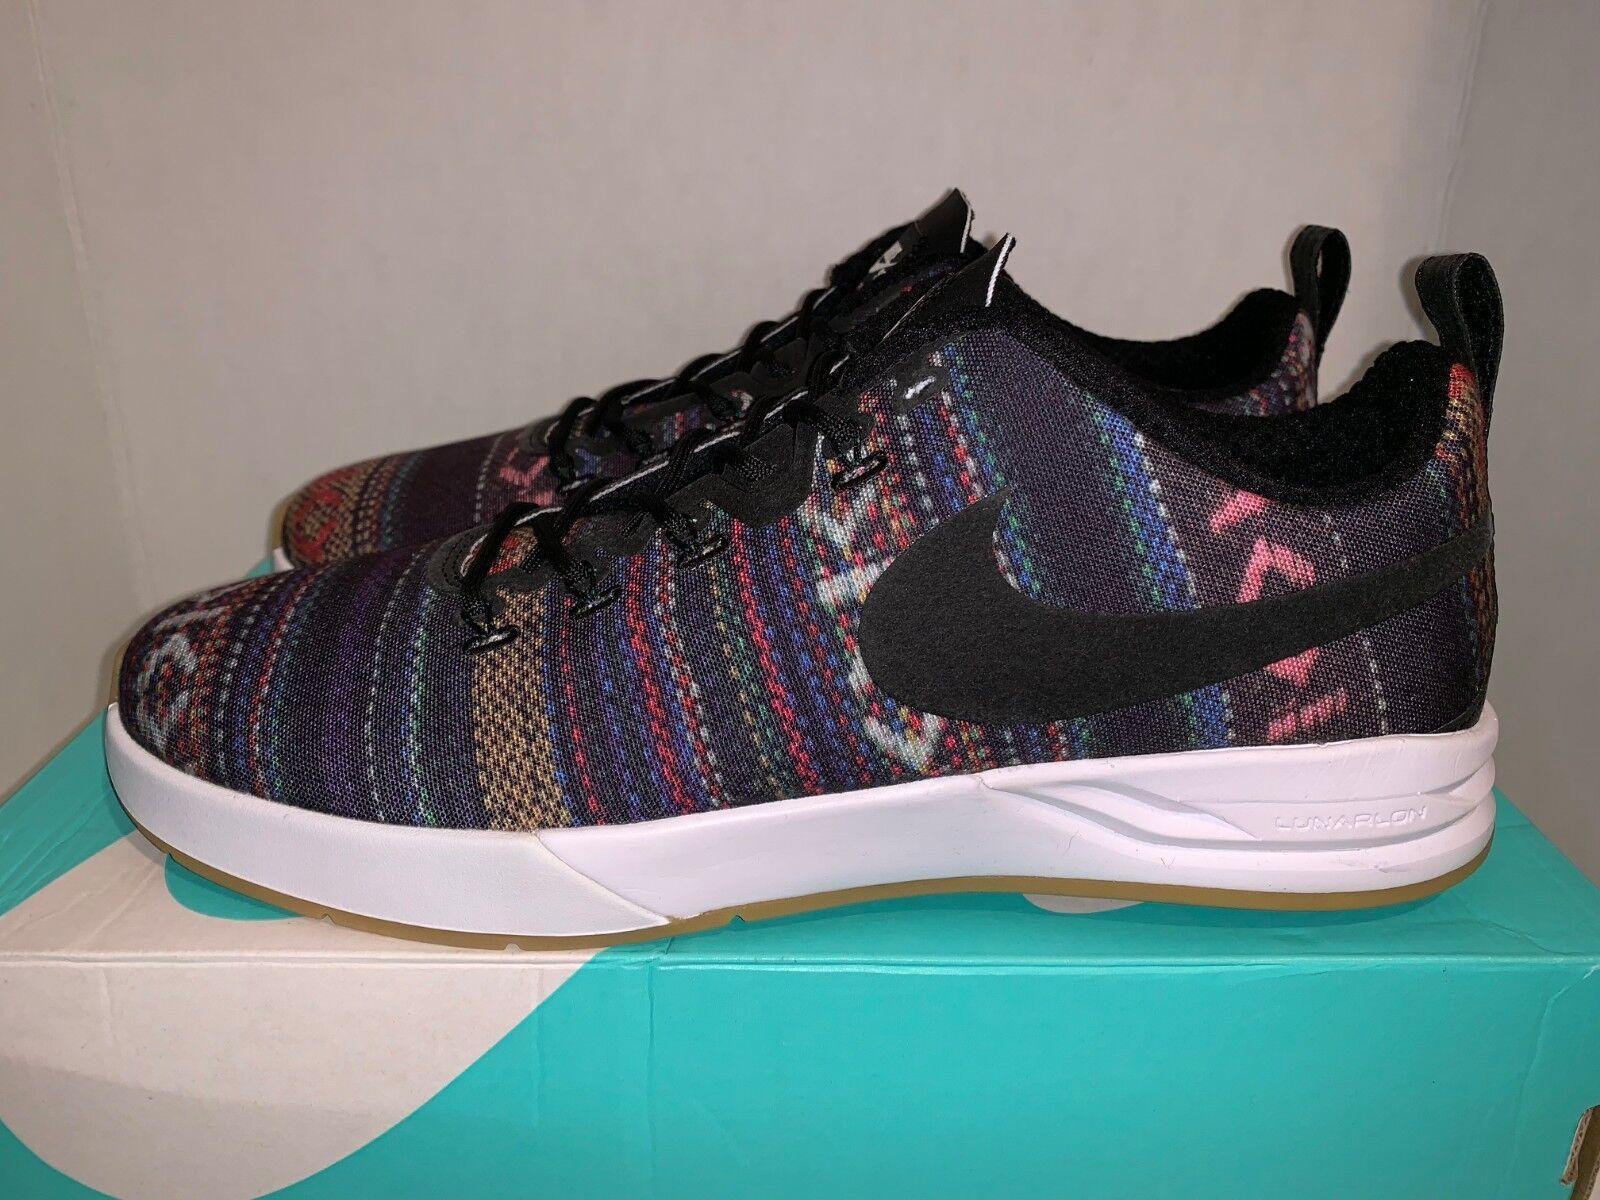 Nike SB Project BA R R  Hacky Sak  Size 11   654892 902